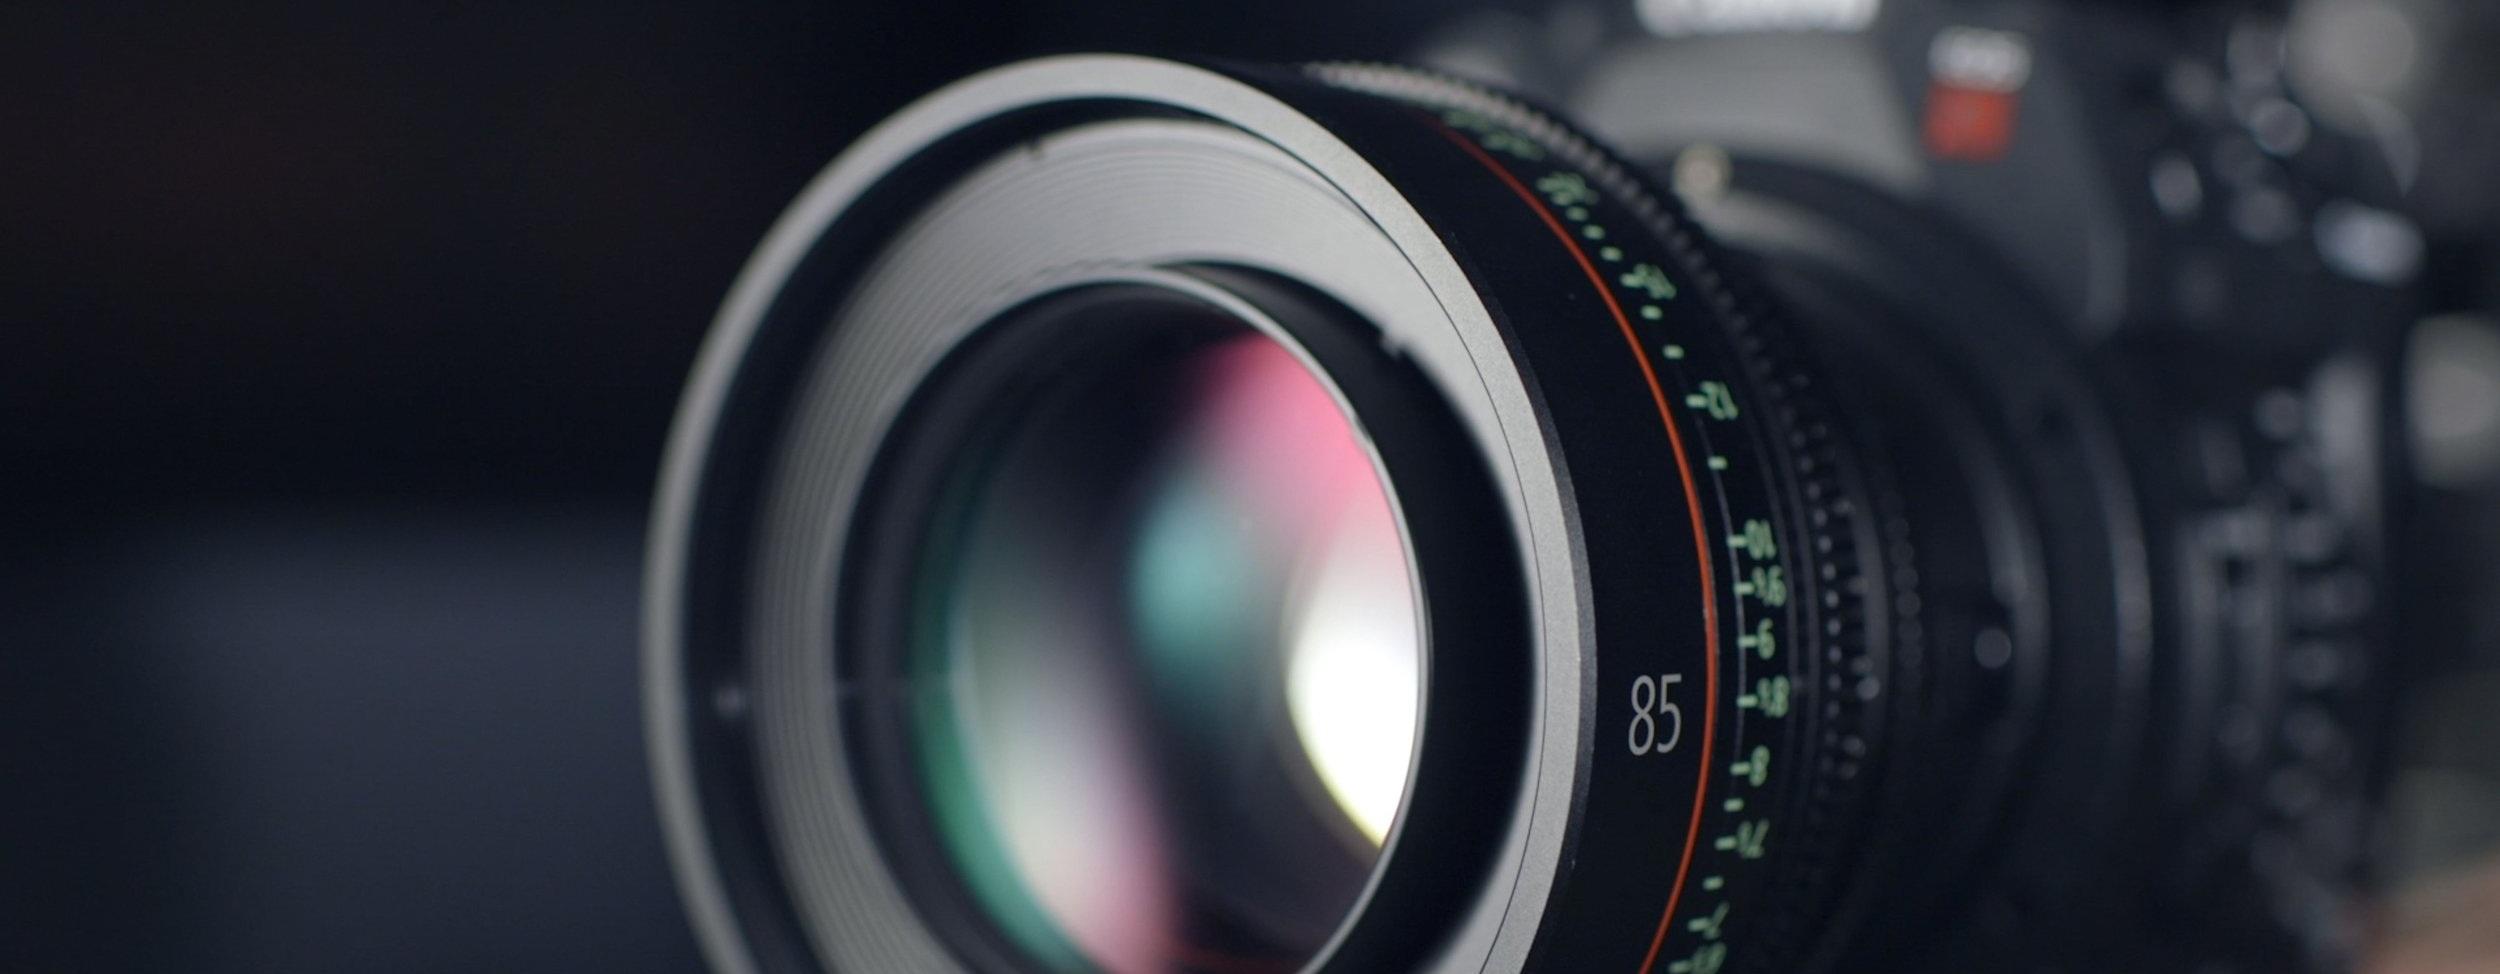 Unsplash+-+camera.jpg